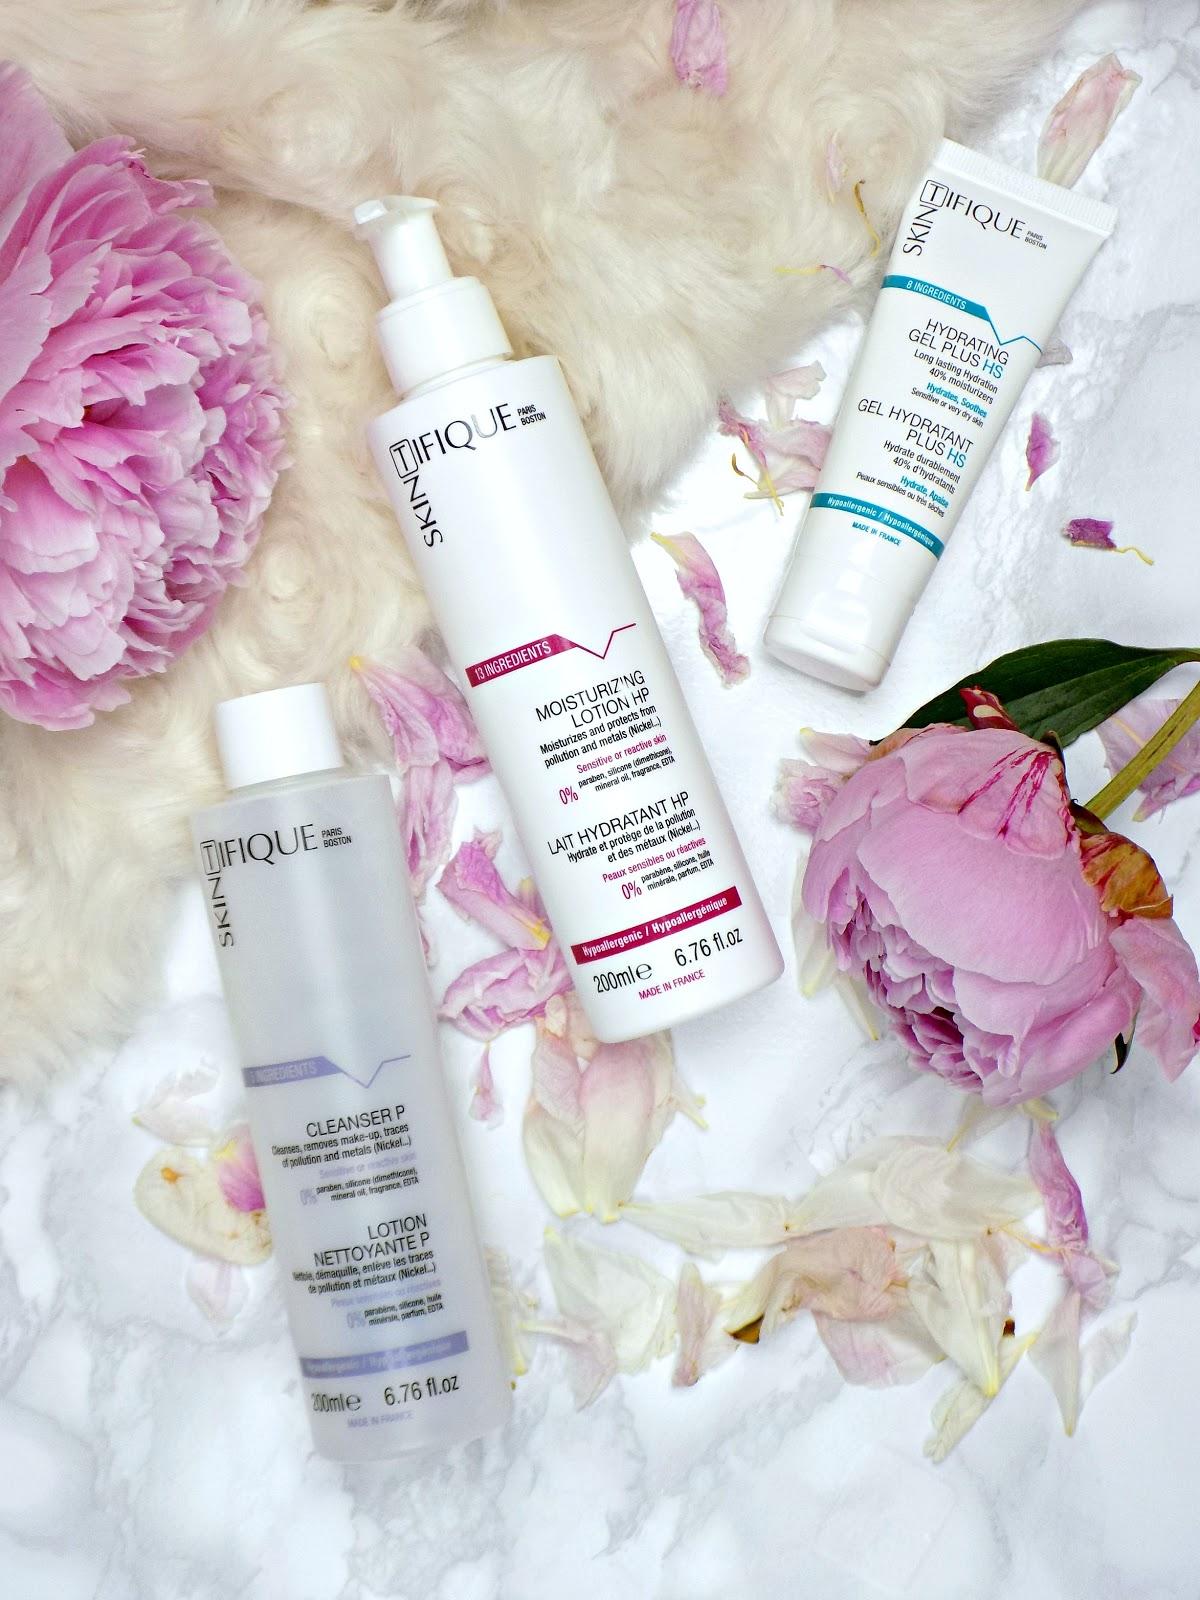 Skintifique products for sensitive skin